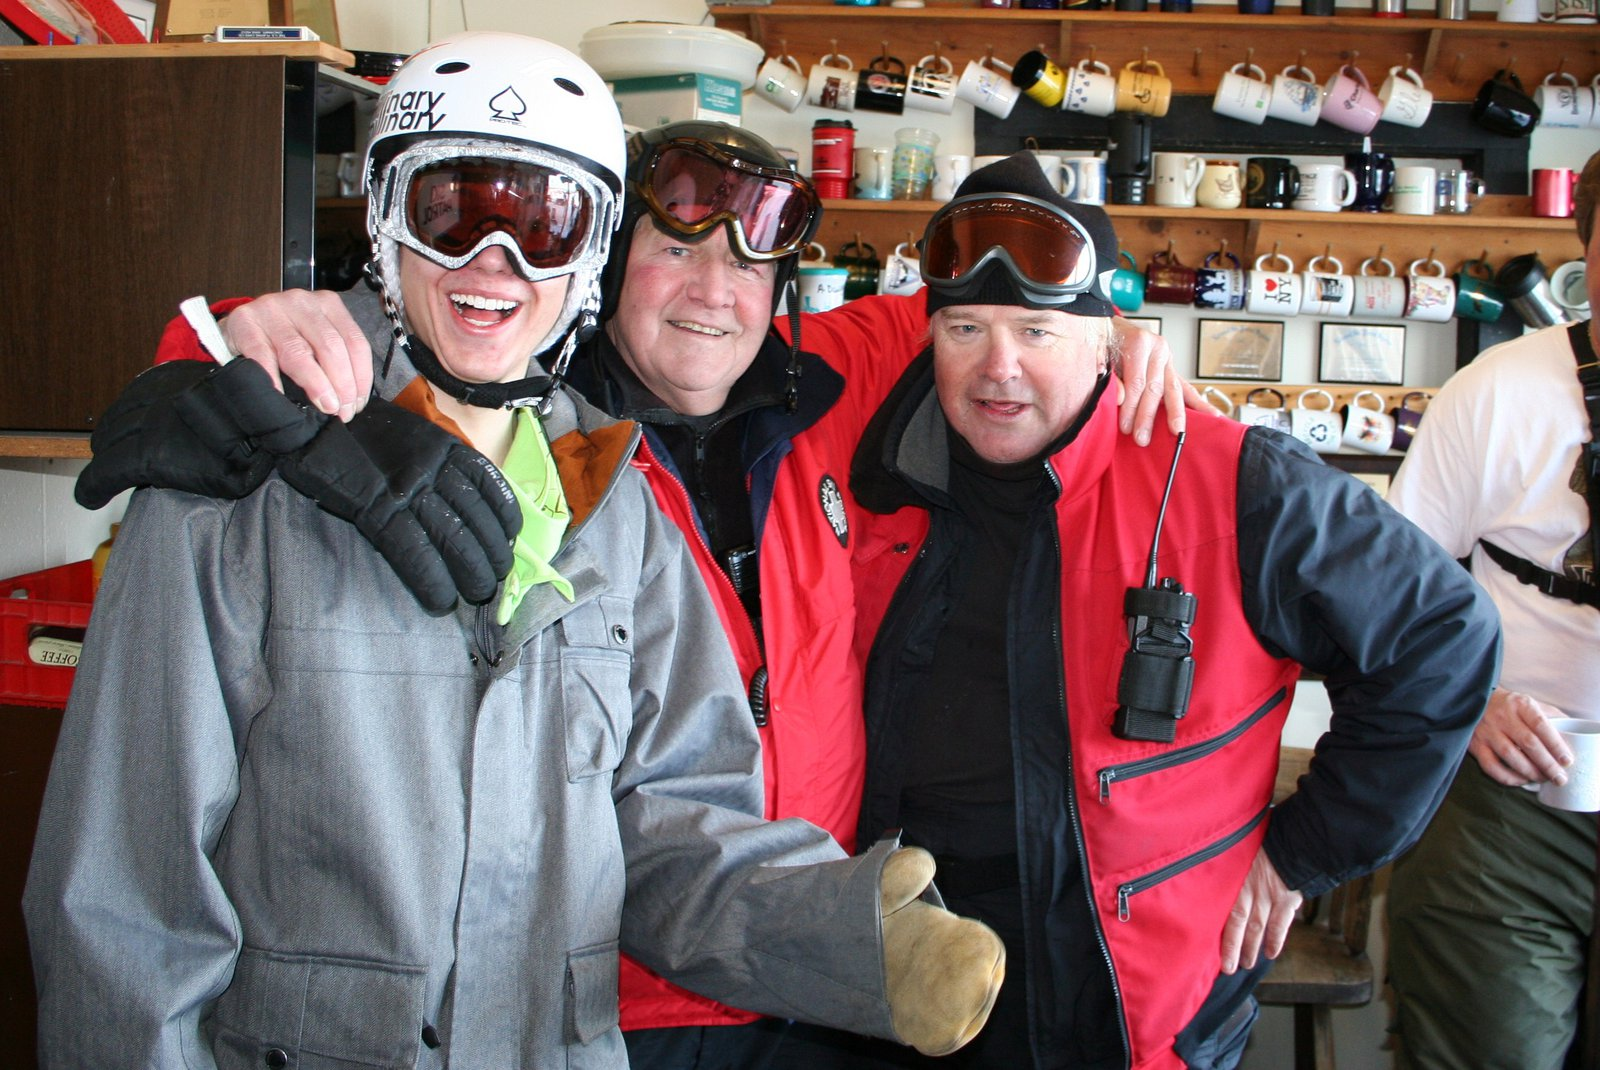 Ski patrol.